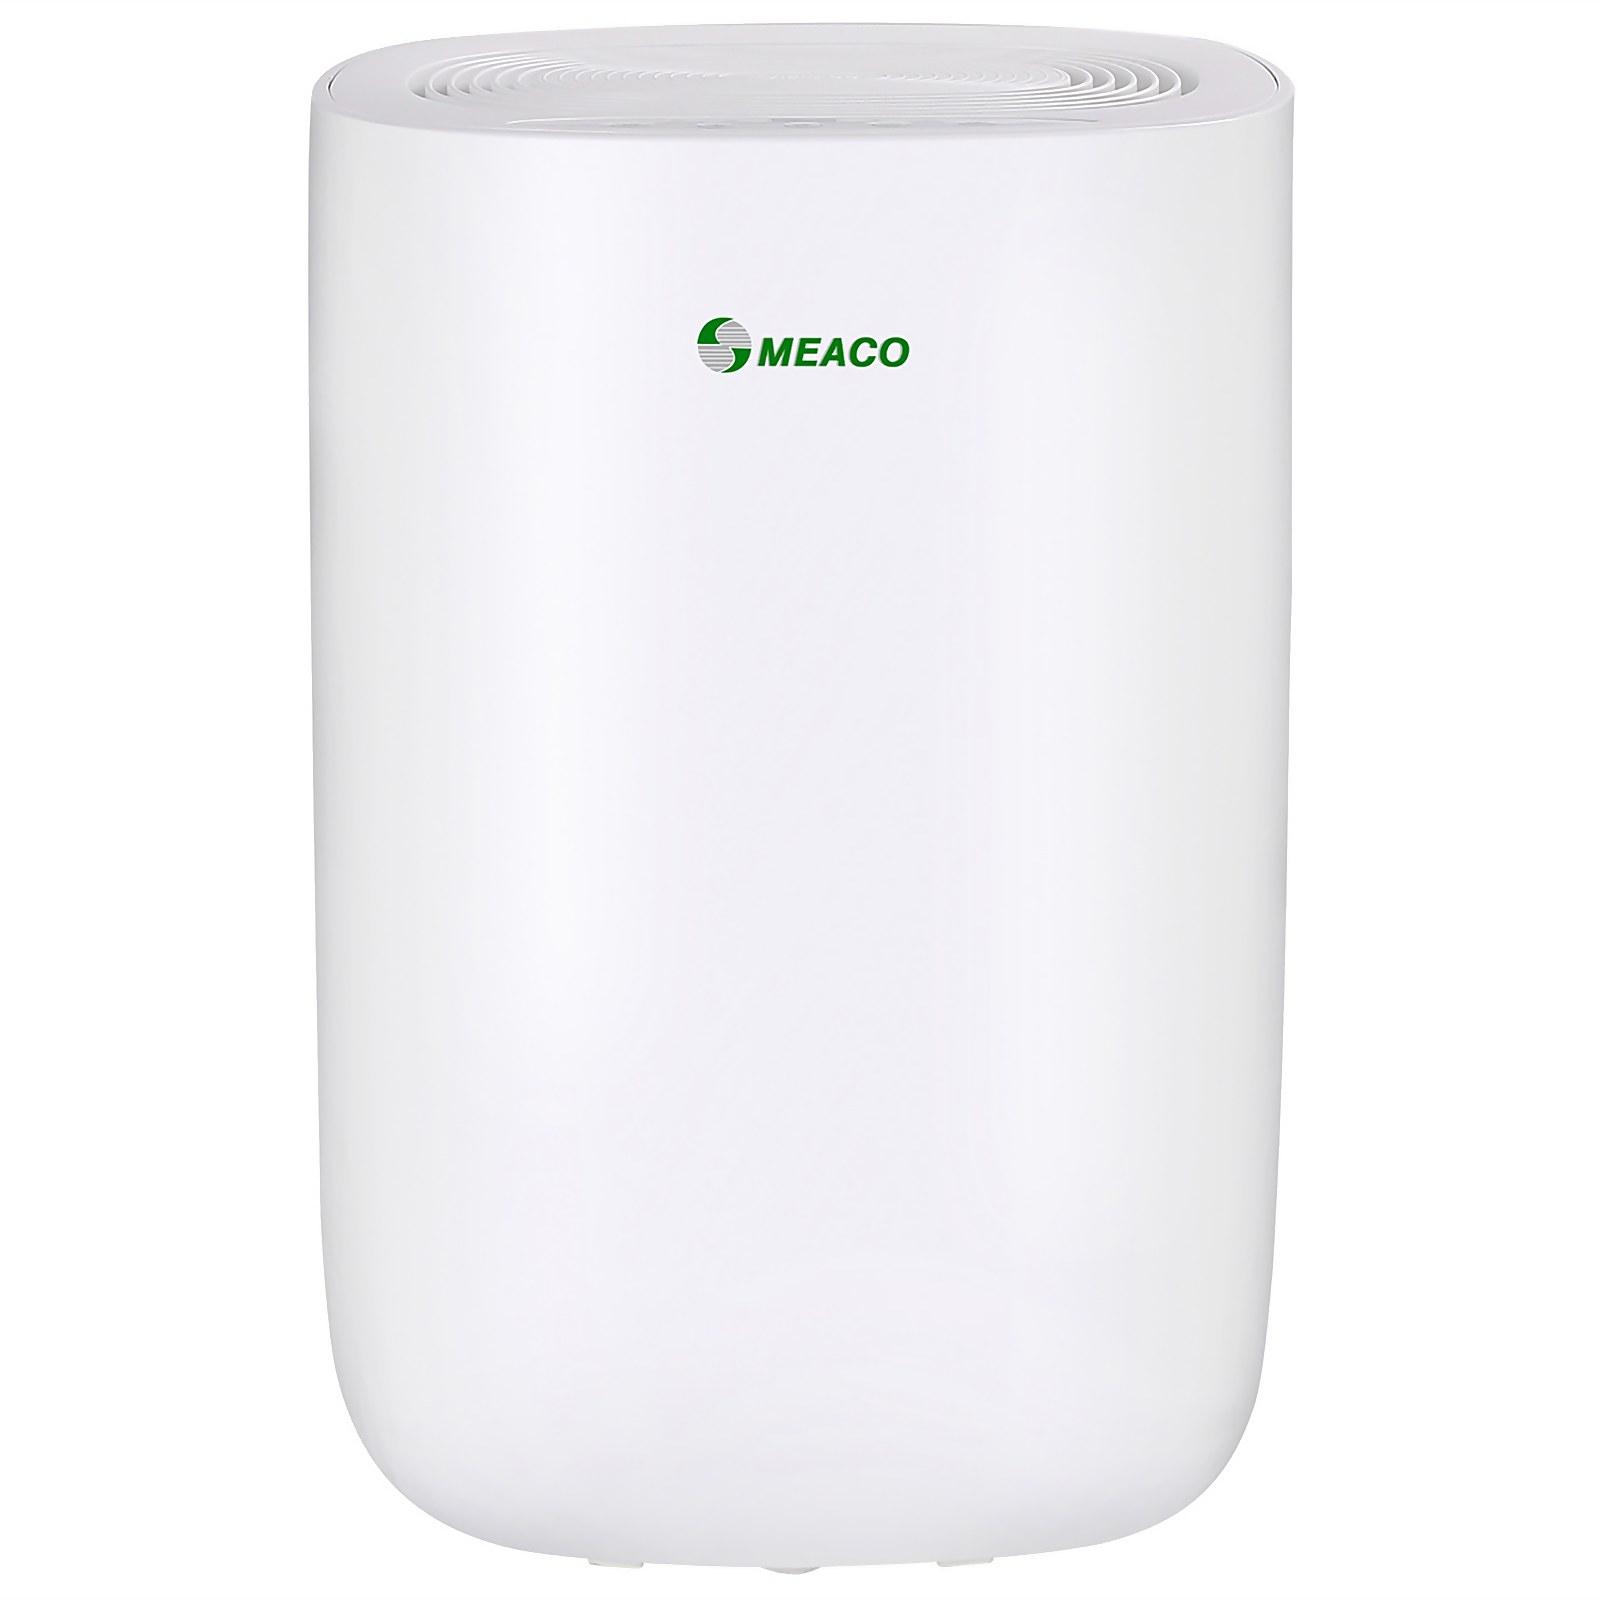 Meaco Dry ABC 12L Dehumidifier - White